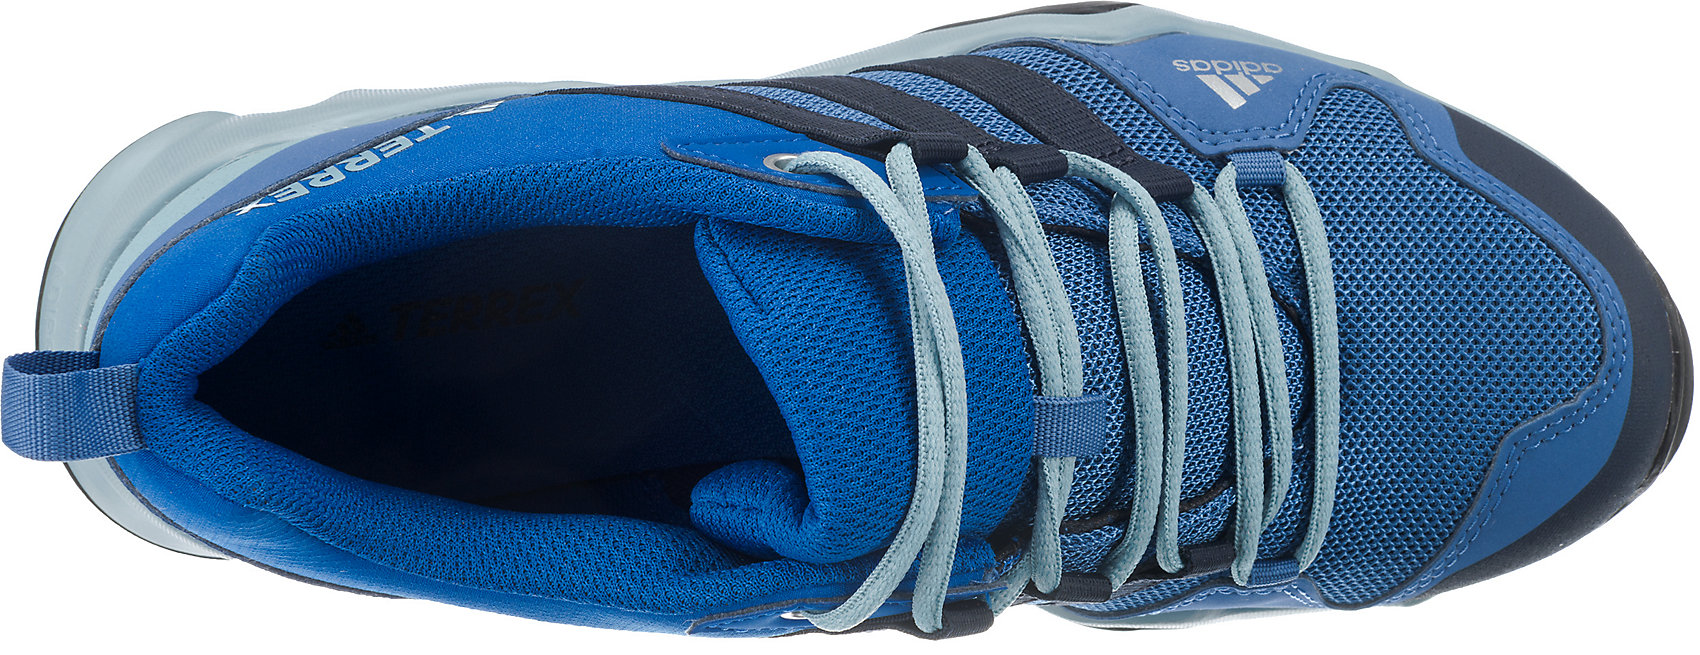 Details zu Neu adidas Performance Outdoorschuhe TERREX AX2R K für Mädchen 7207578